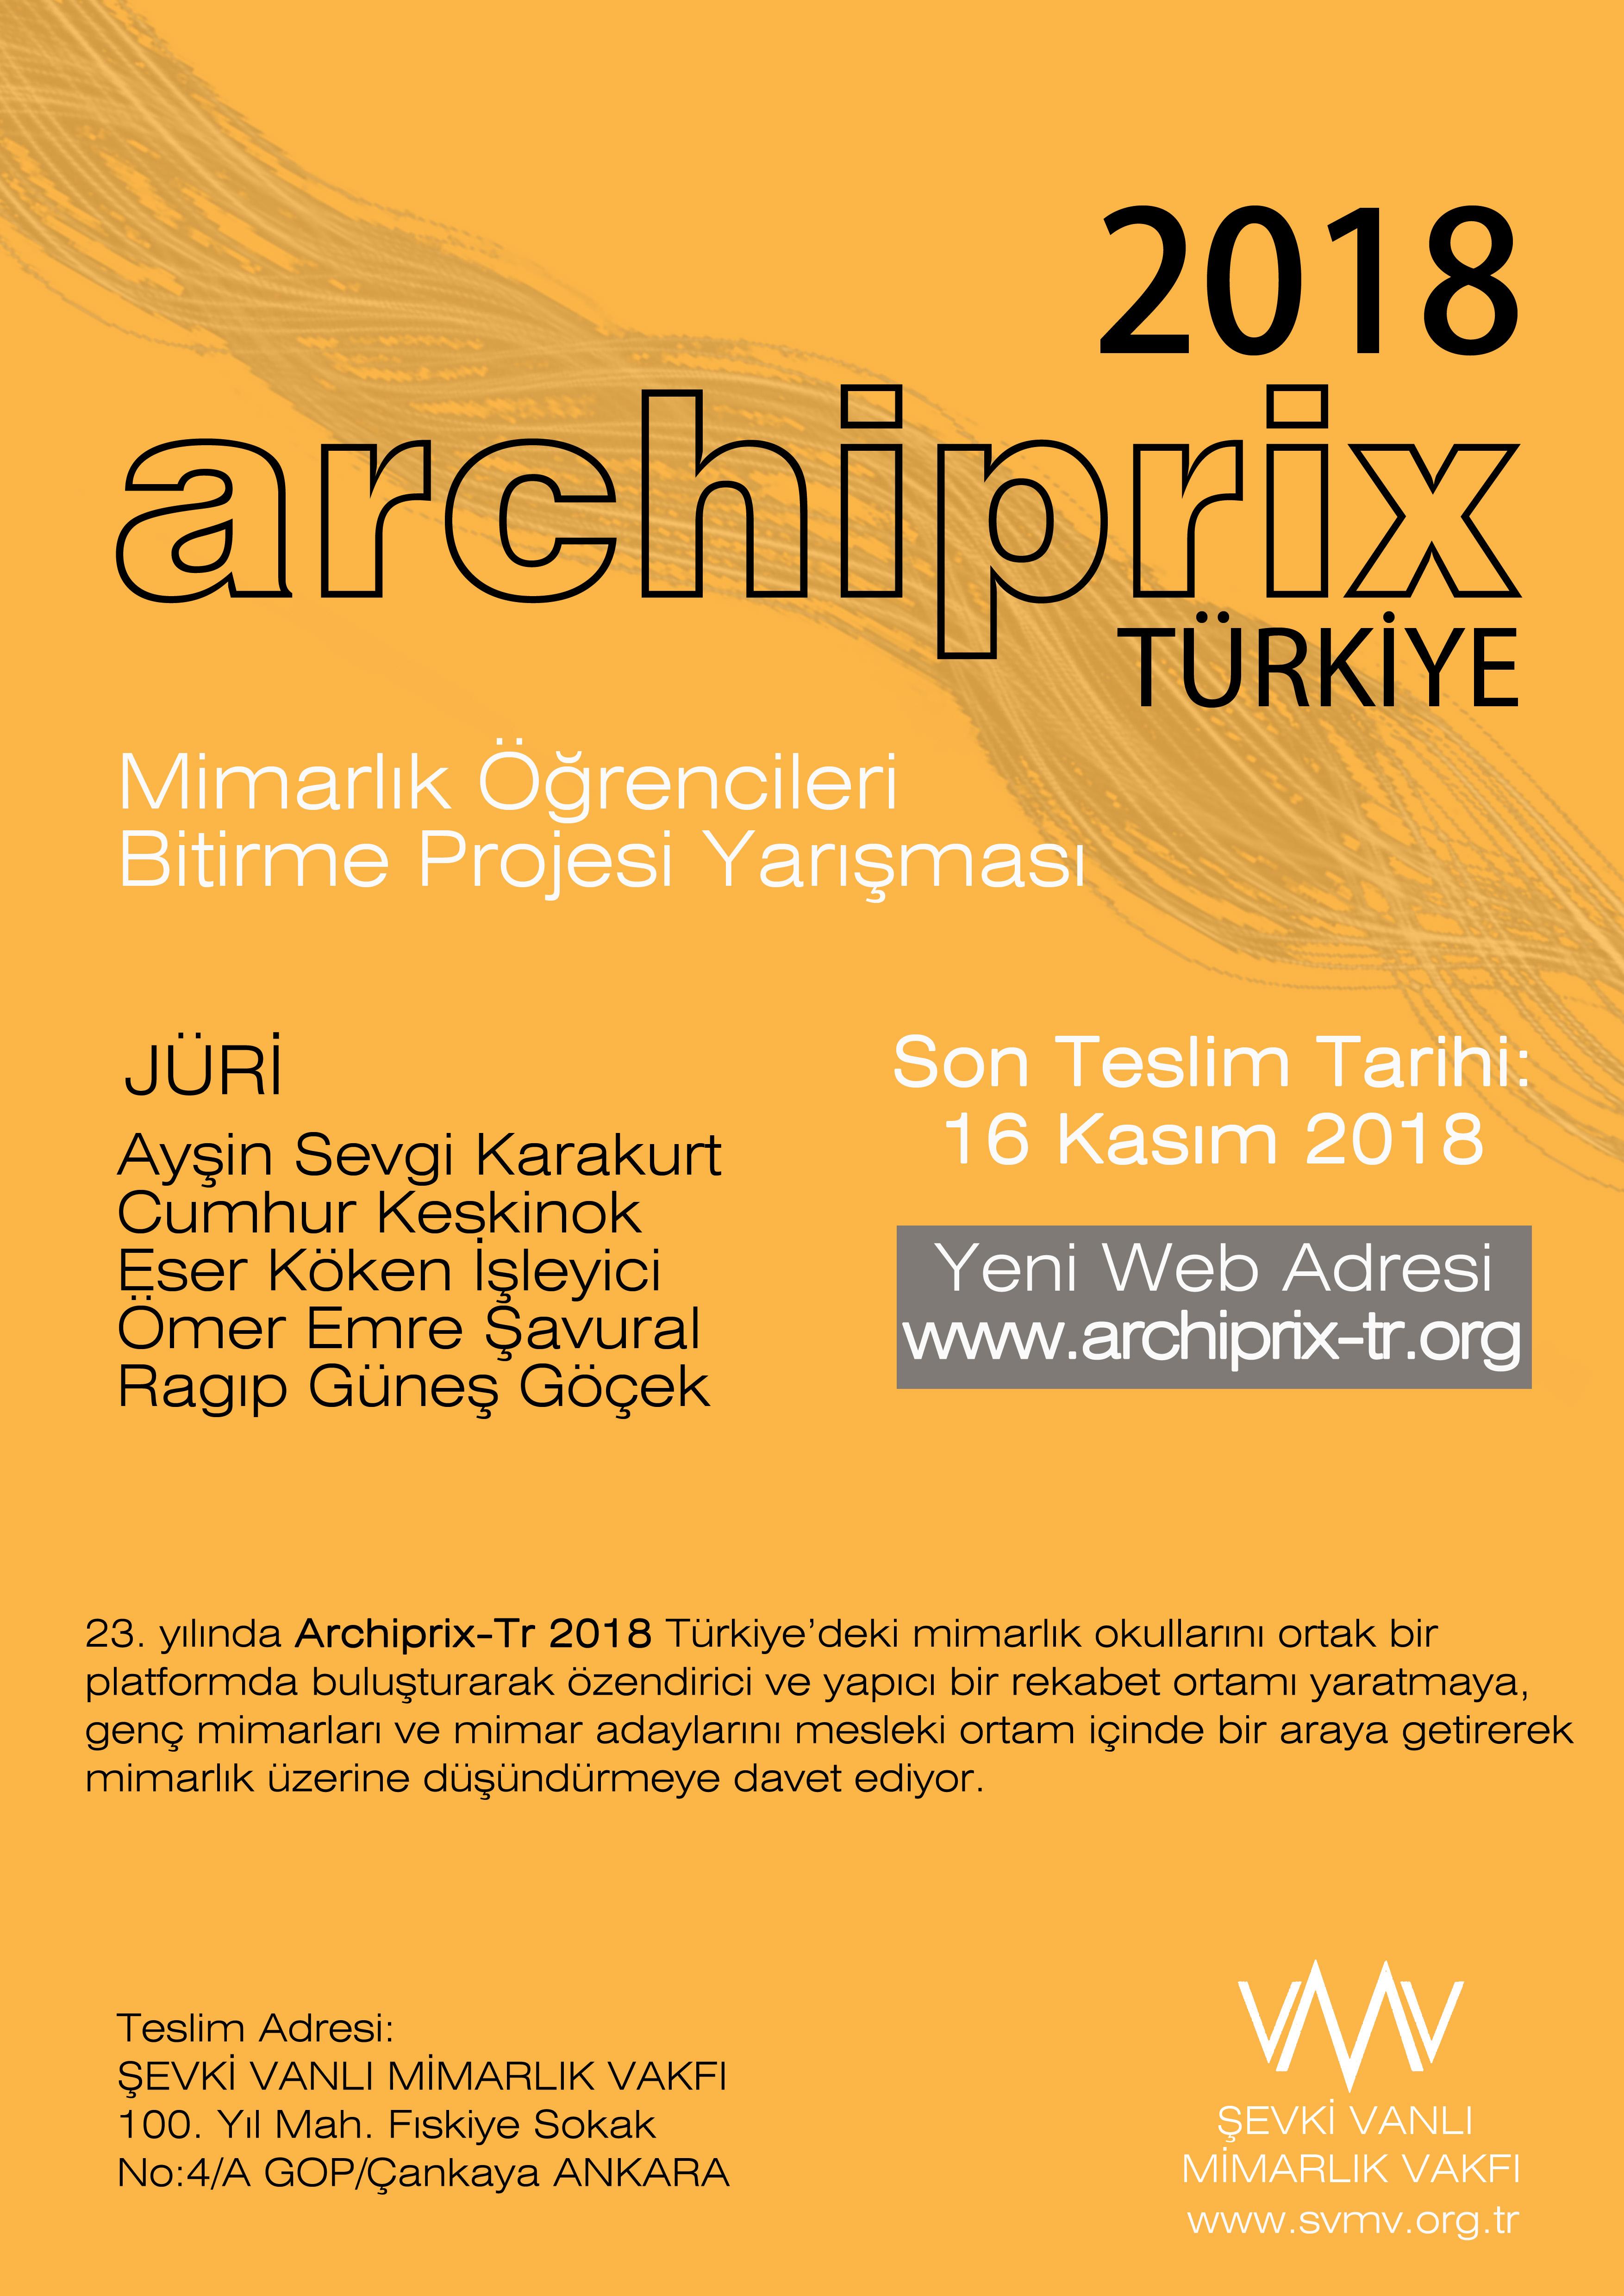 Archiprix-Tr 2018 Afis